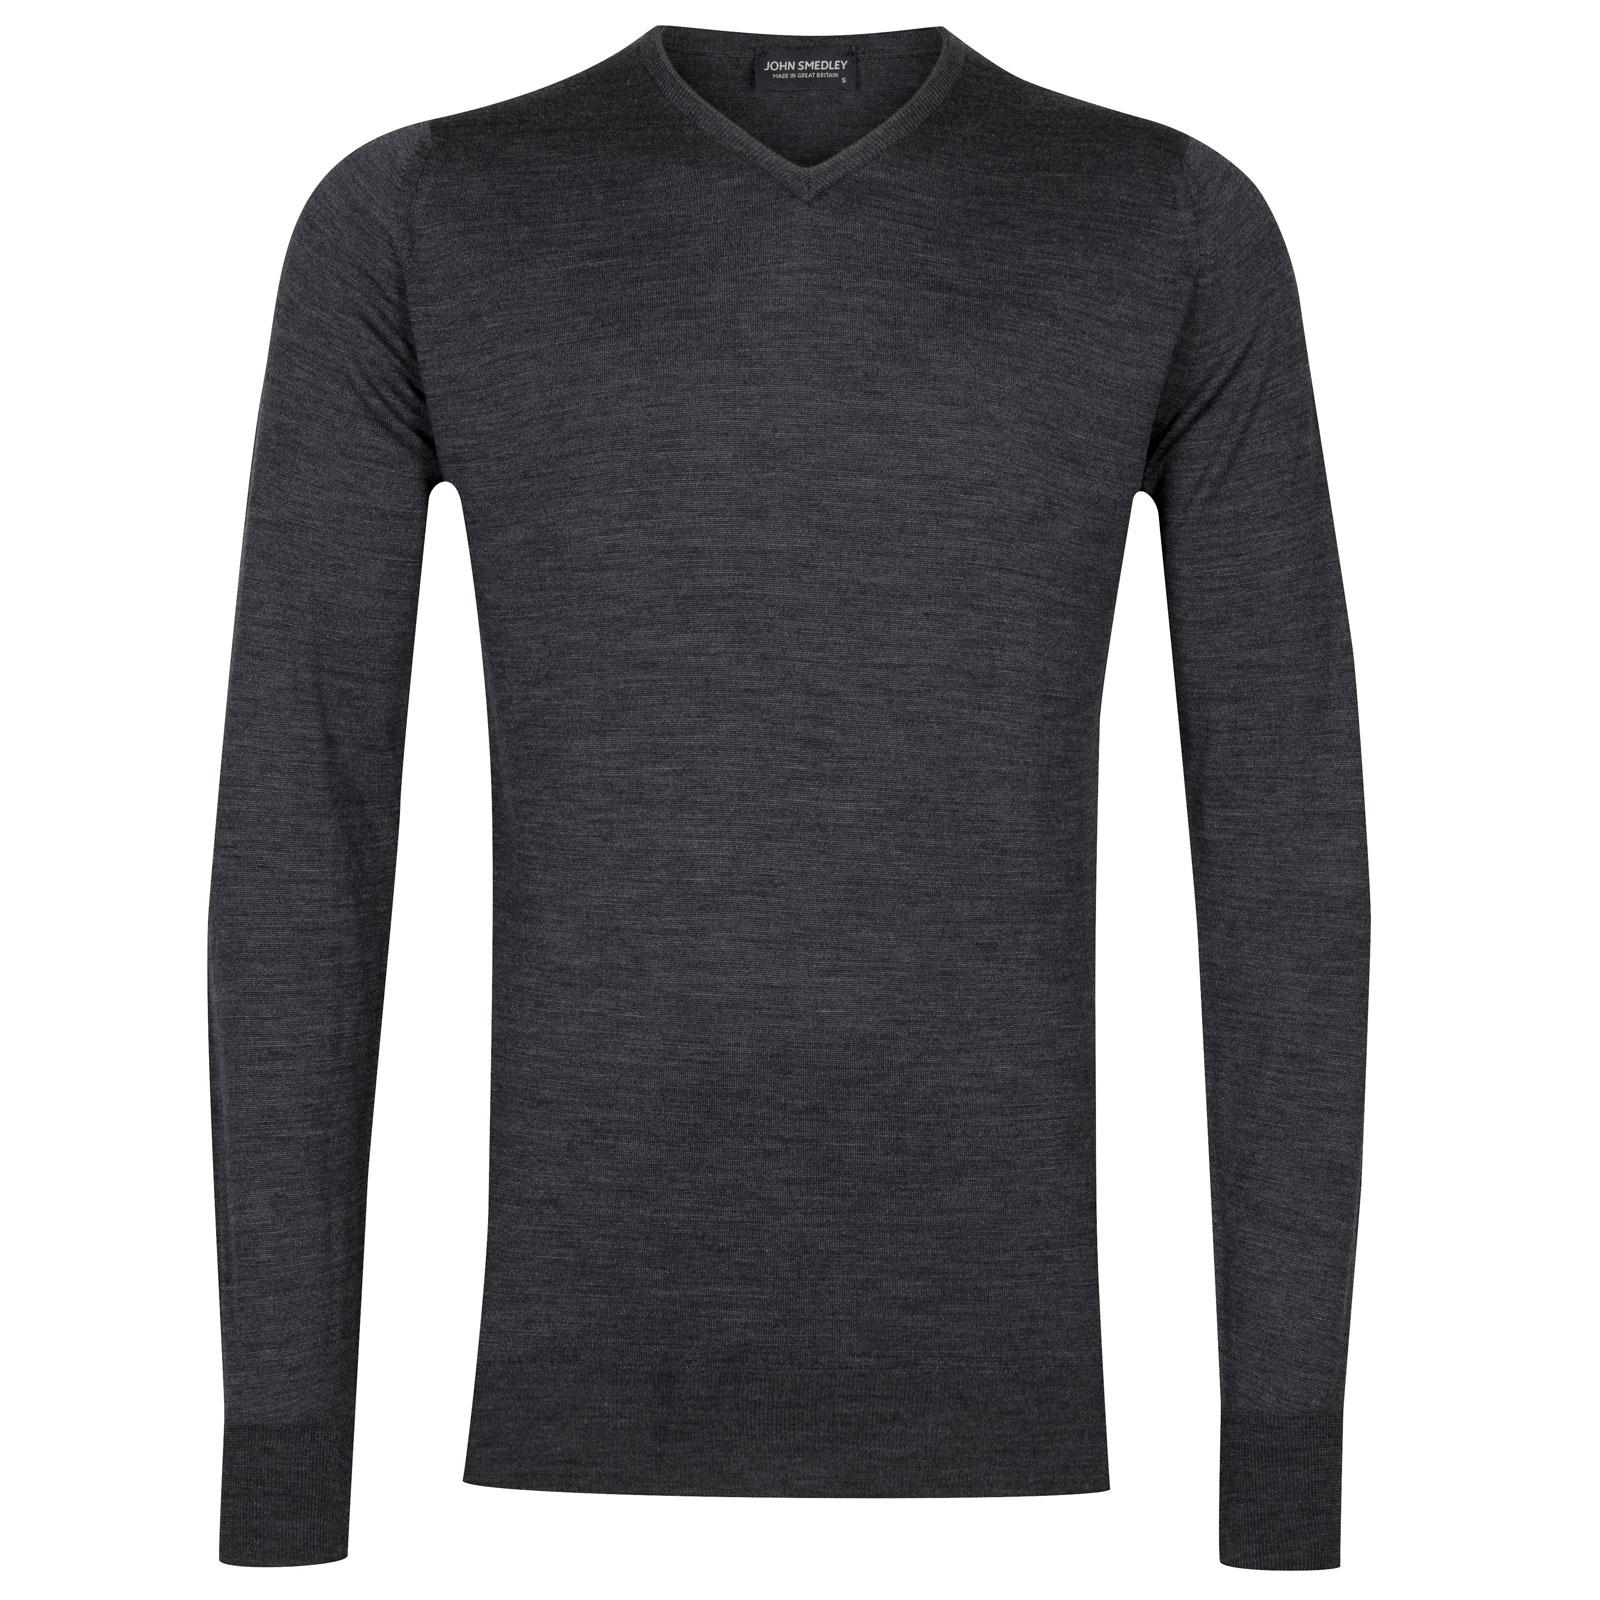 John Smedley shipton Merino Wool Pullover in Charcoal-M